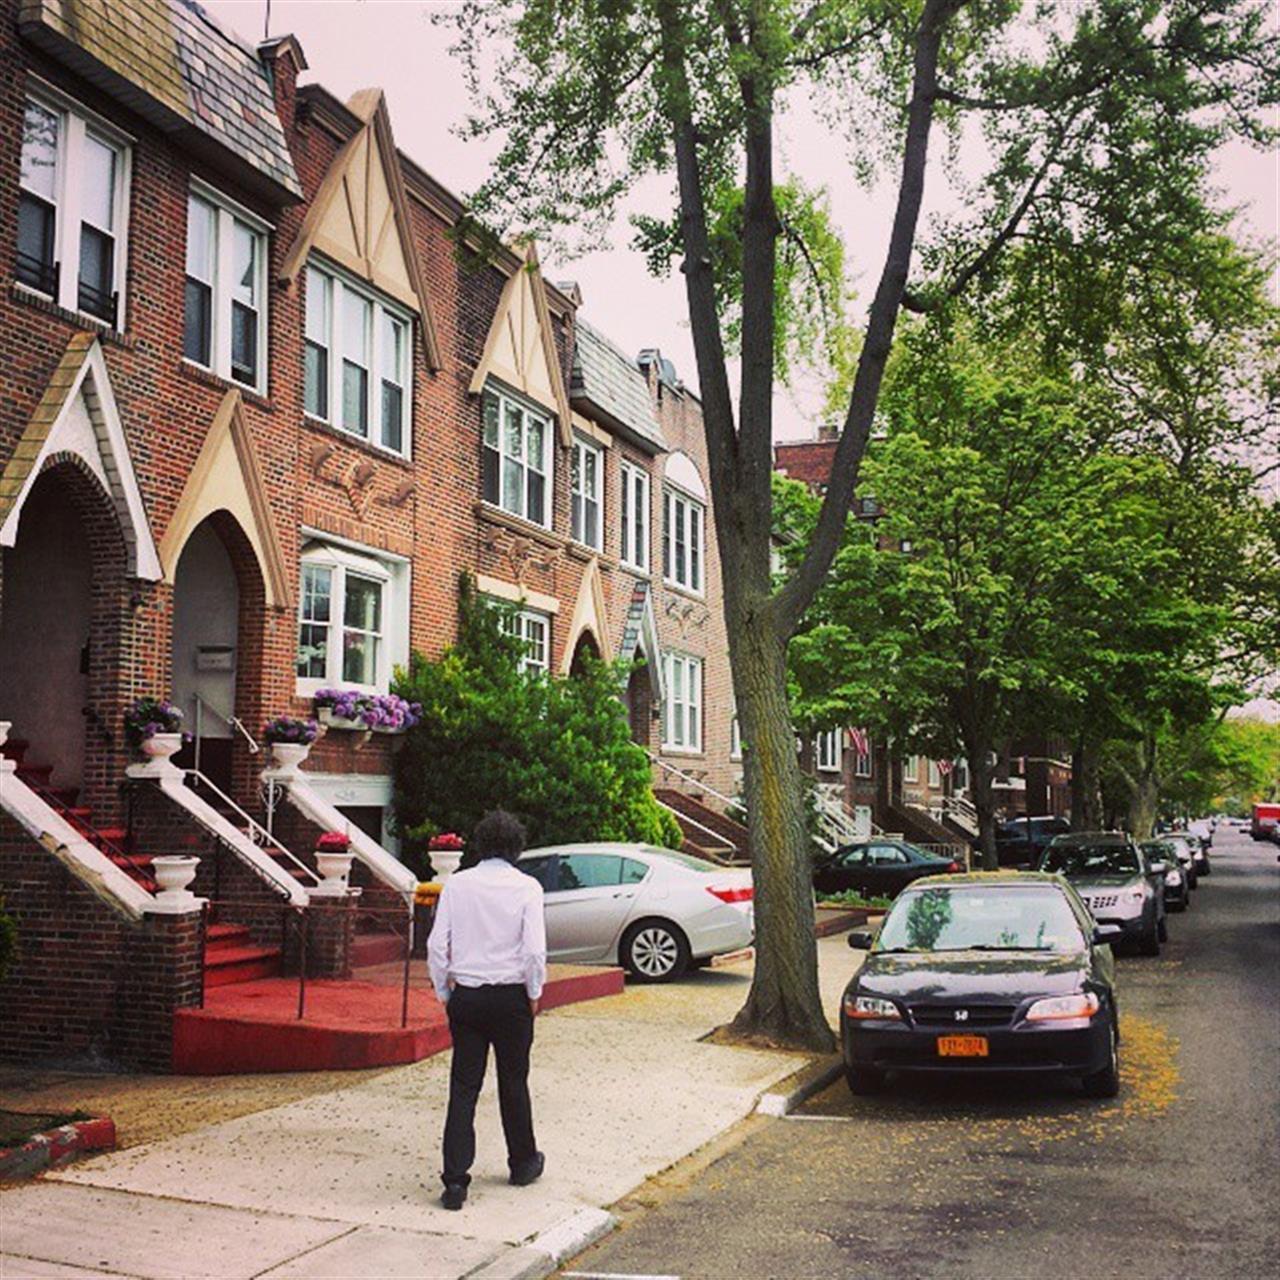 Nice block in Gravesend #nyc #brooklyn #gravesend #usa #america #realtor #realestate #architecture #city #urban #property #homes #bkoriginal #leadingRElocal